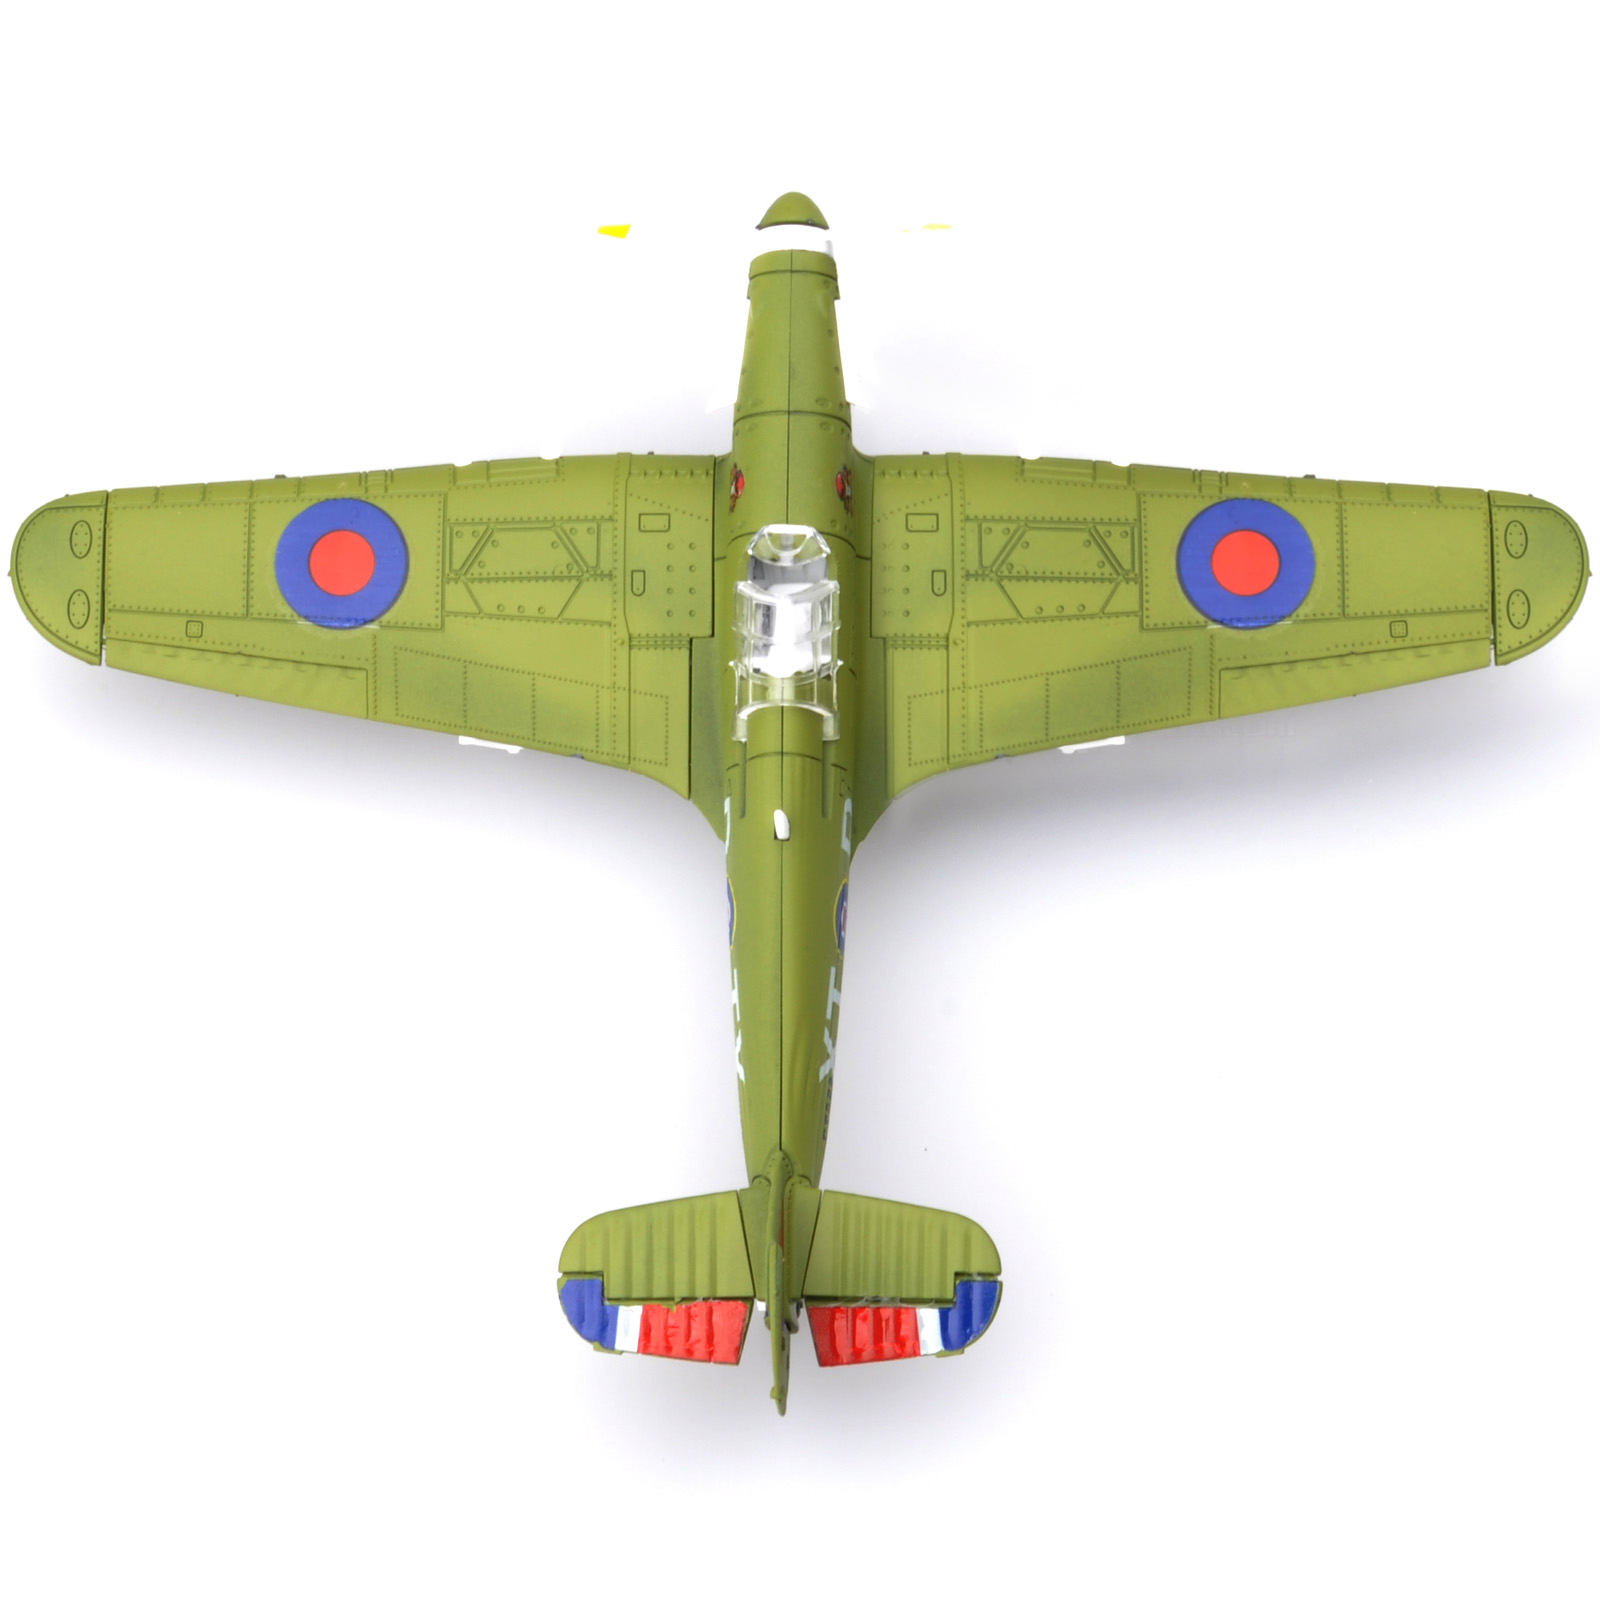 4D Model playmobile brinquedos toys for children boys Plastic Aircraft Model 1/48 Supermarine Spitfire Fighter 6